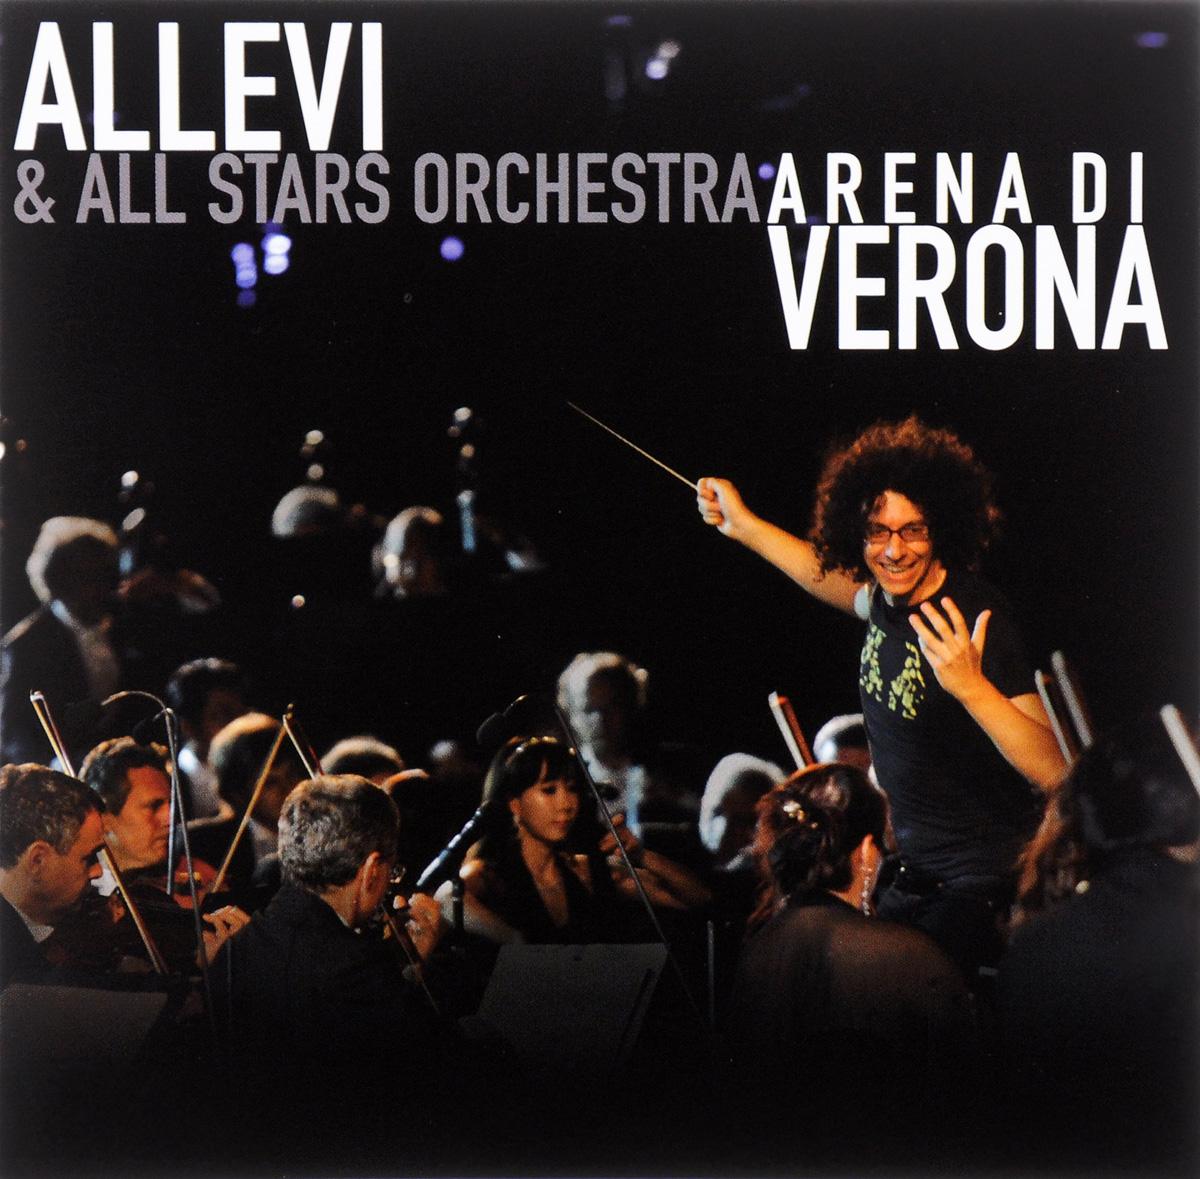 Джиованни Эллеви,All Stars Orchestra Giovanni Allevi & All Orchestra. Arena Di Verona (CD + DVD)